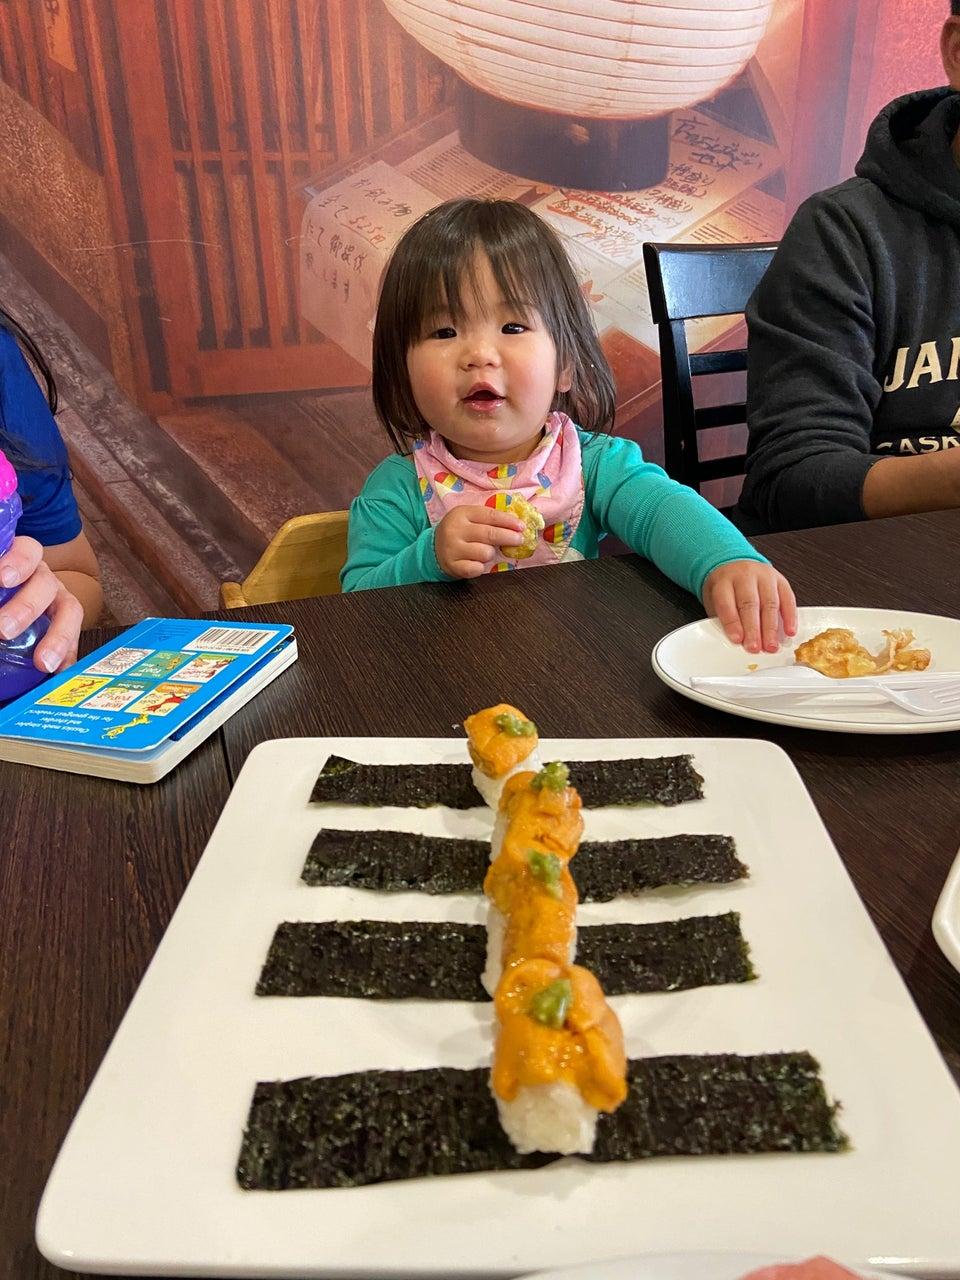 Hanako Japanese Cuisine 12550 Centralia St, Lakewood